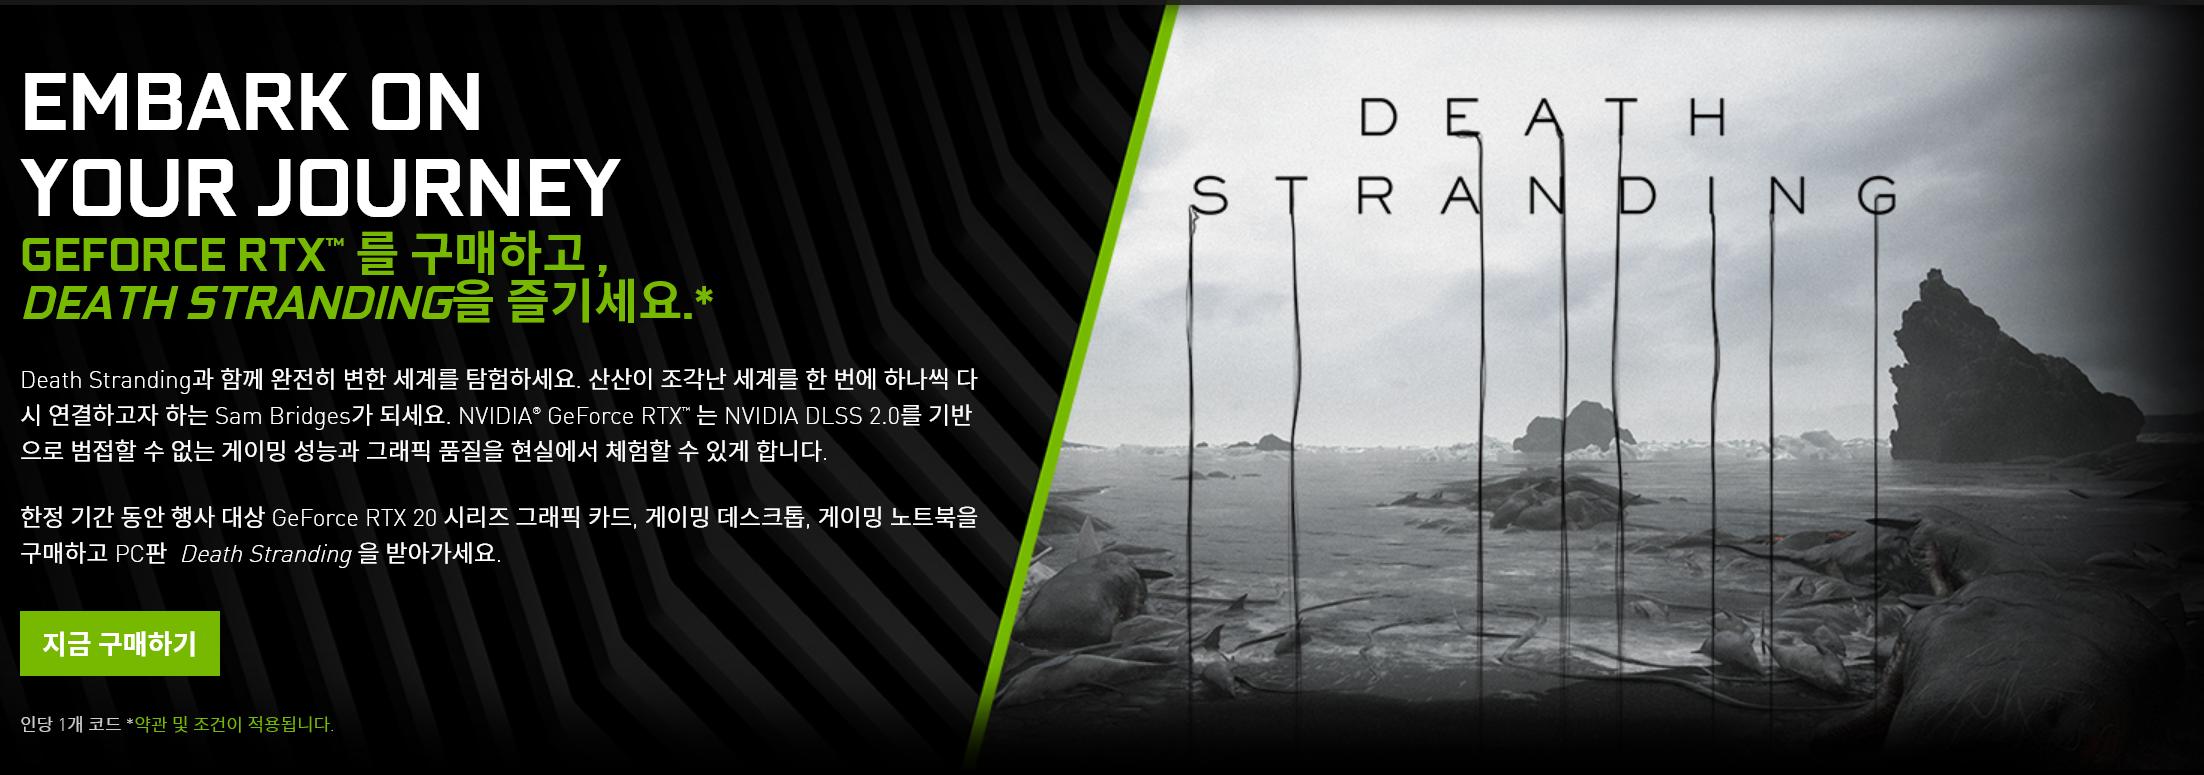 Screenshot_2020-07-10 GeForce RTX 번들을 구매하고 PC판 Death Stranding을 받아가세요 .png